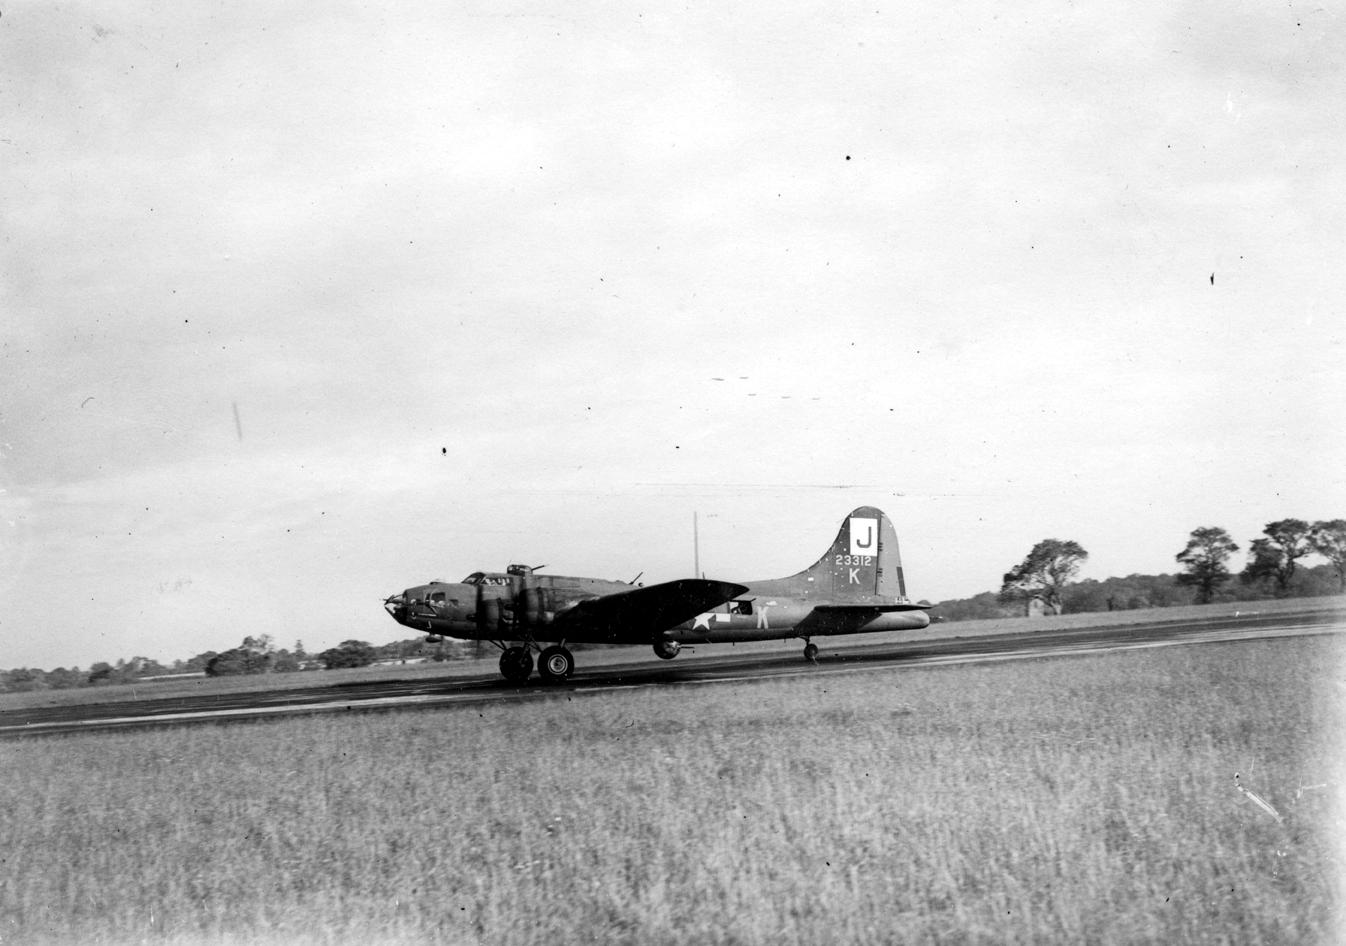 B-17 #42-3312